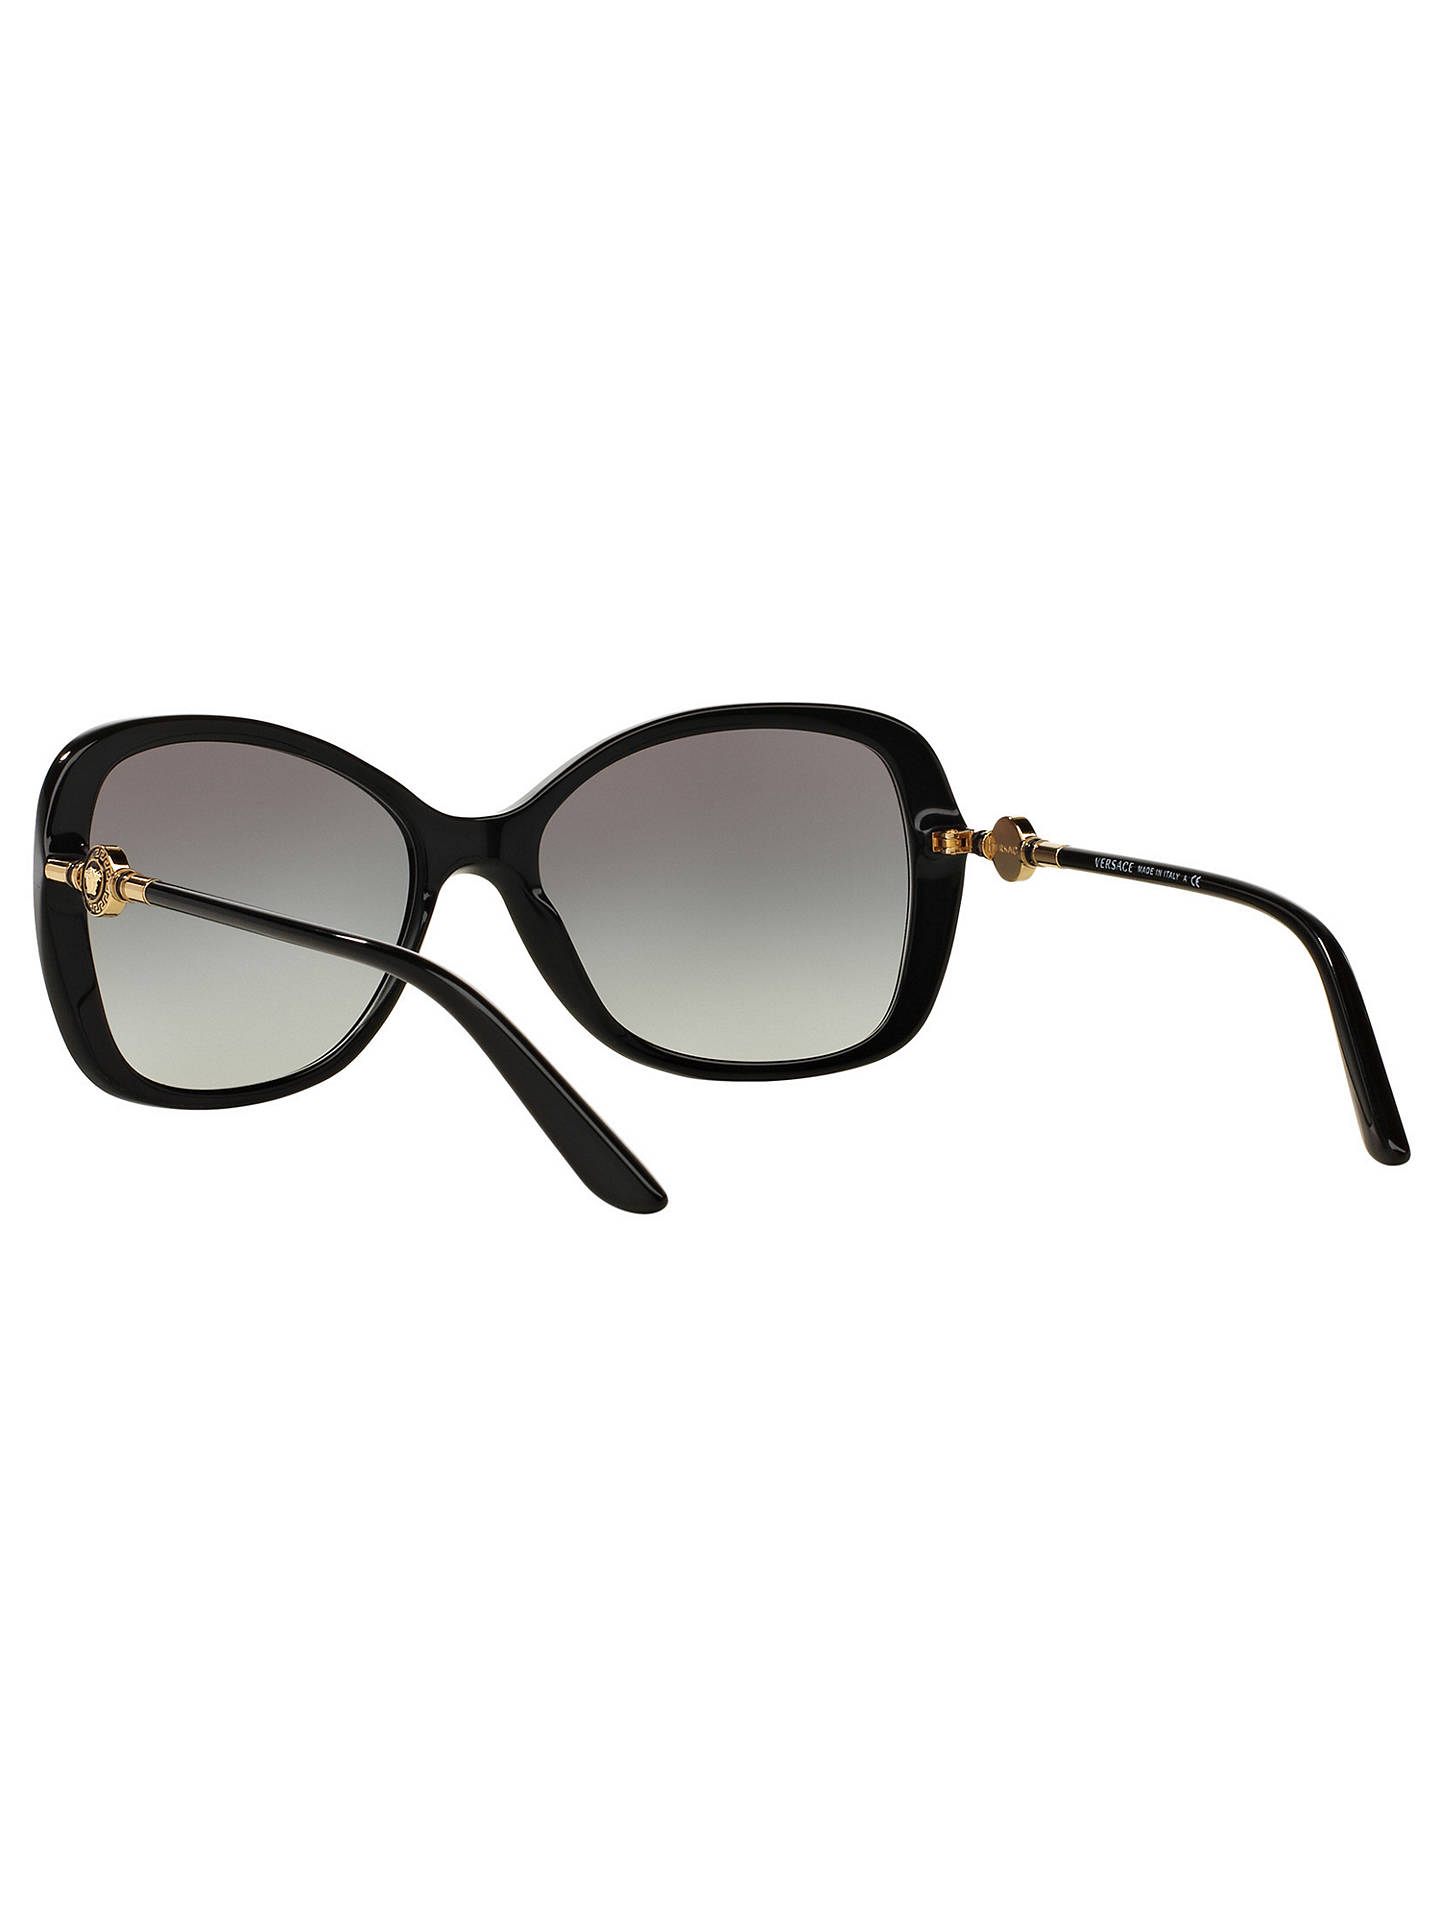 9627fc37c026 ... Buy Versace VE4303 Oversized Square Sunglasses, Black/Grey Gradient  Online at johnlewis.com ...